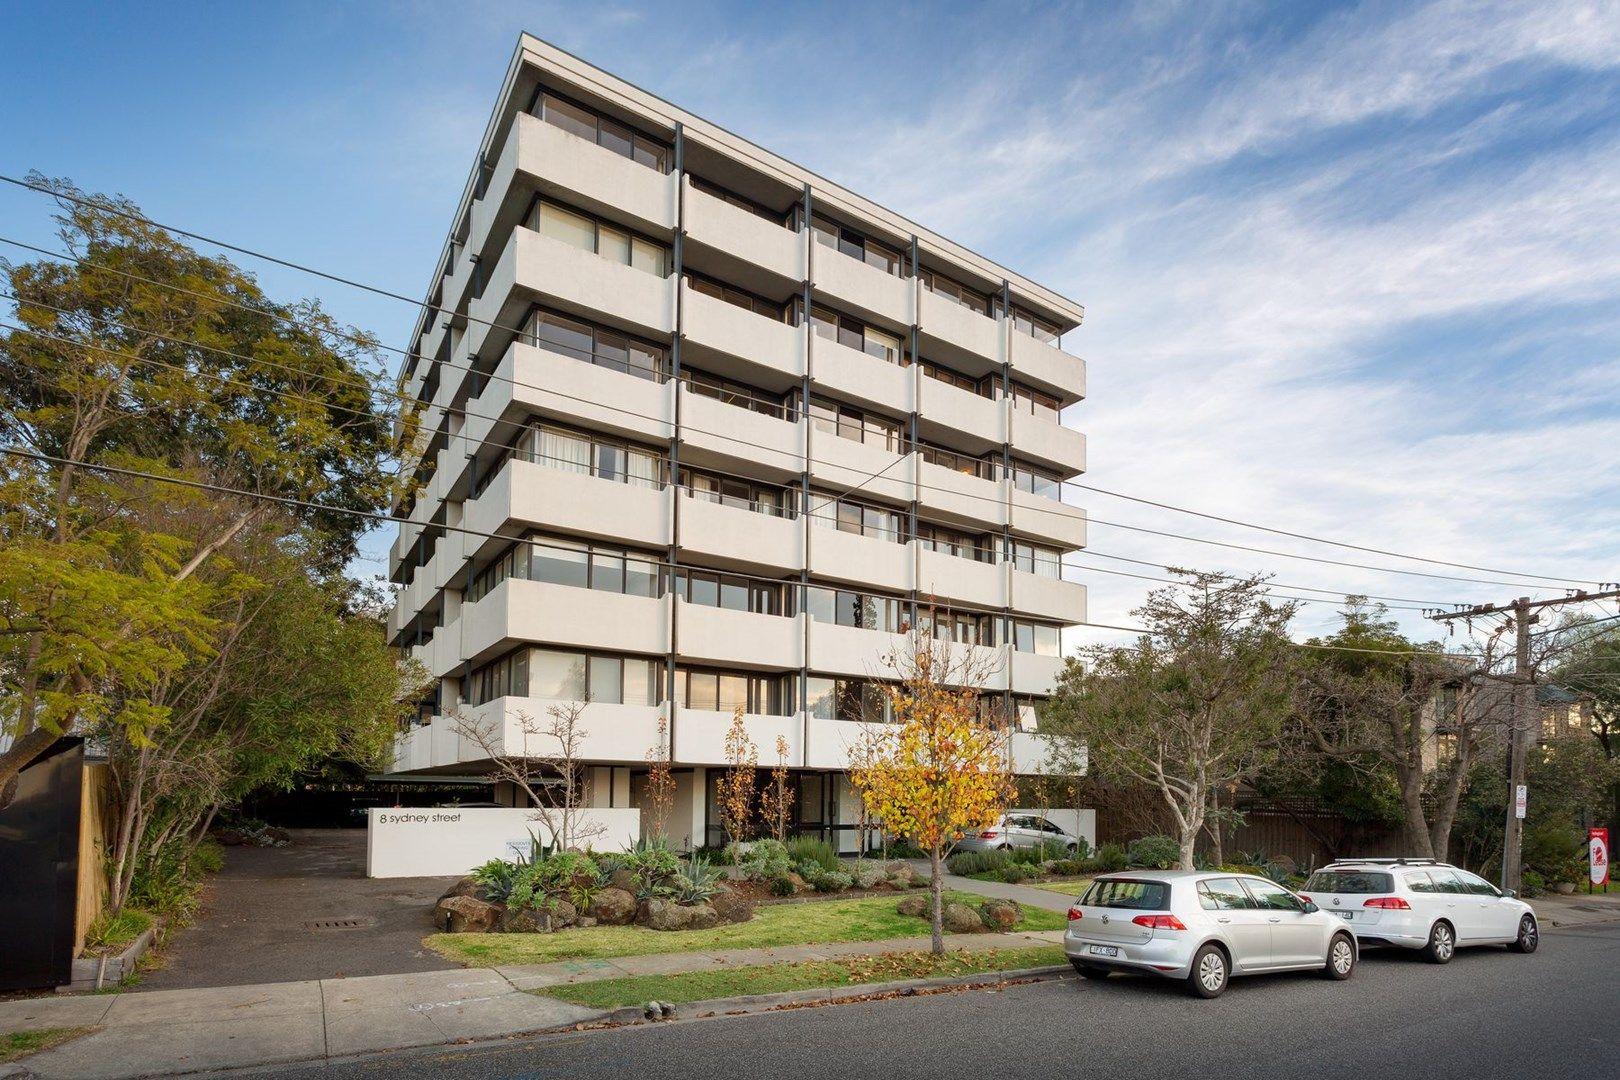 42/8 Sydney Street, Prahran VIC 3181, Image 0